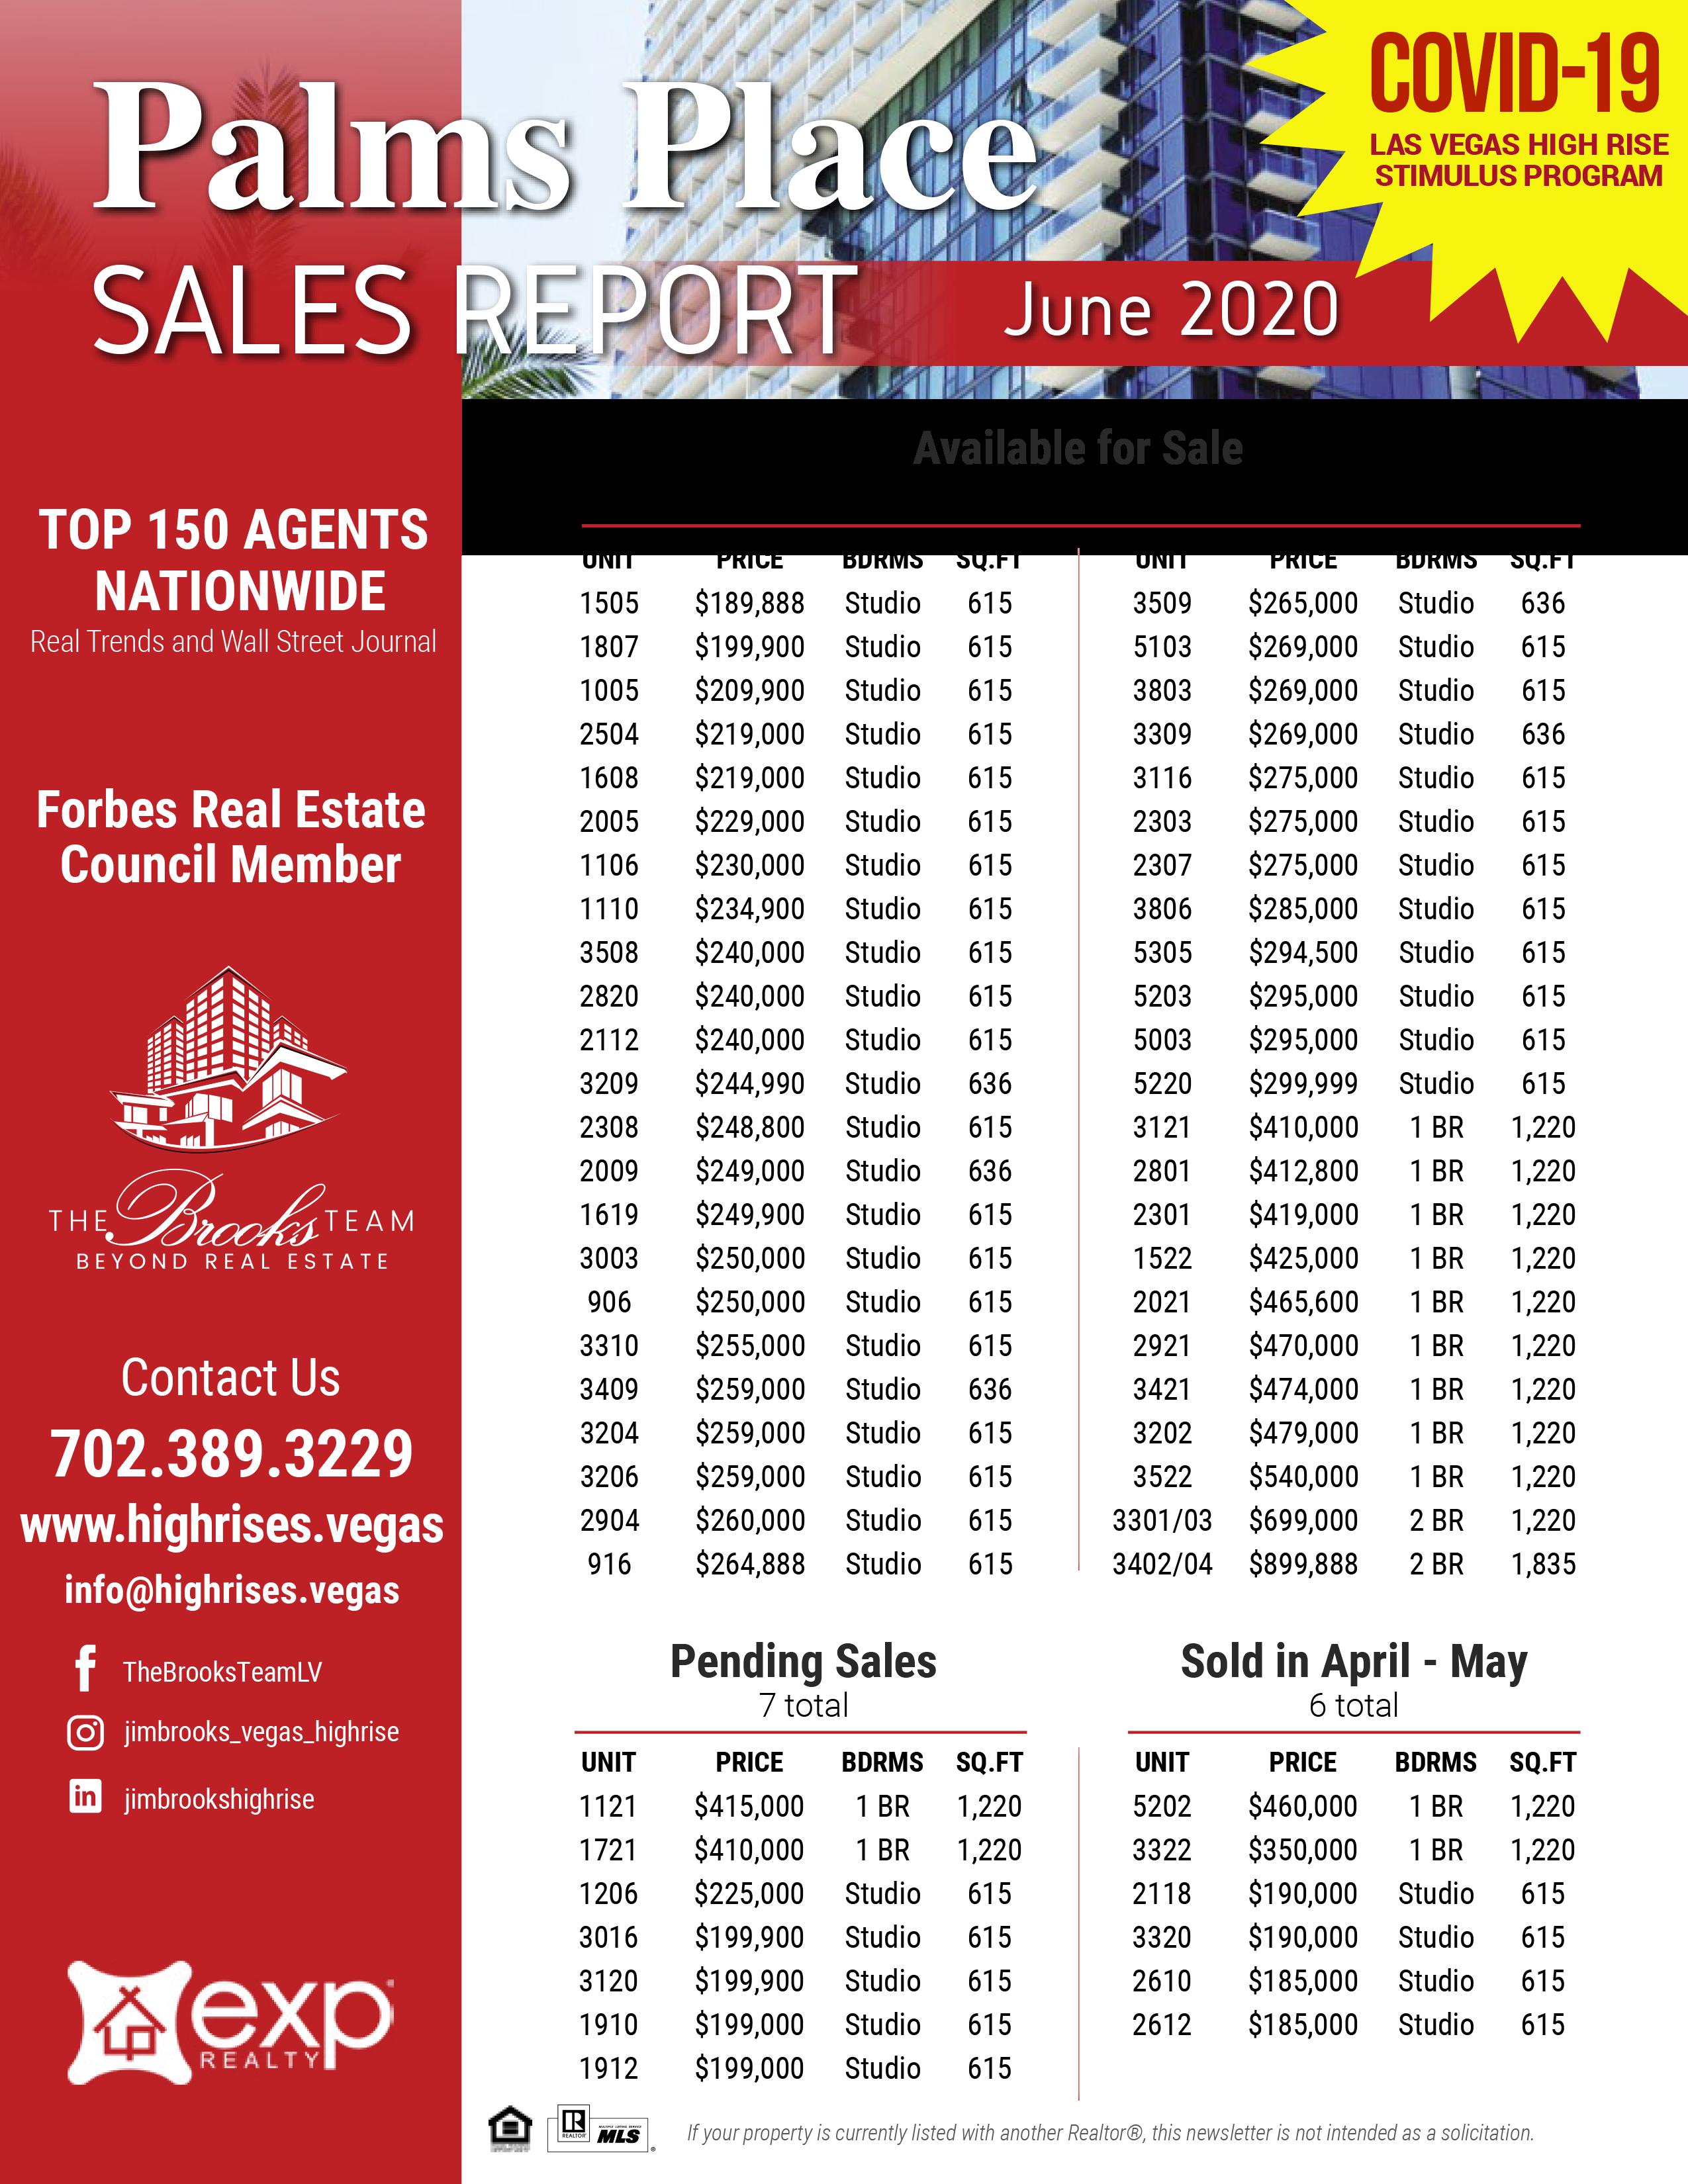 Palms Place Sales Report